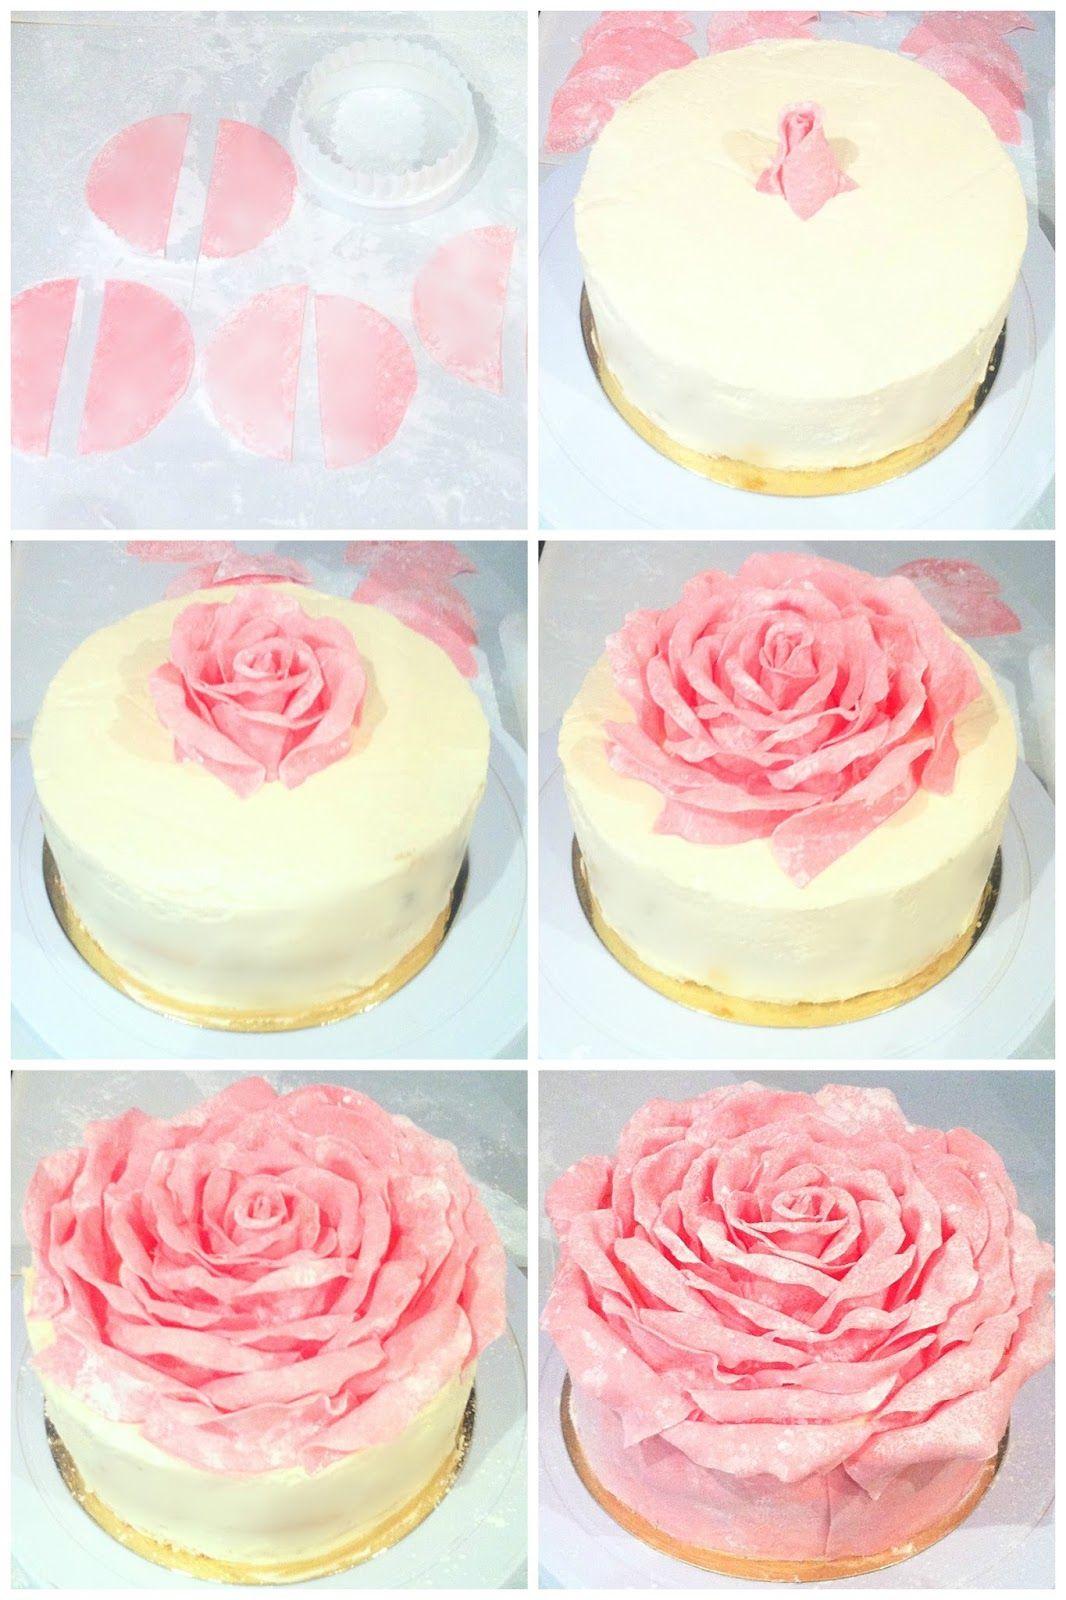 Rose Petal Cake Images : Rose Petal Cake on Pinterest Ruffle Cake, Petal Cake and ...